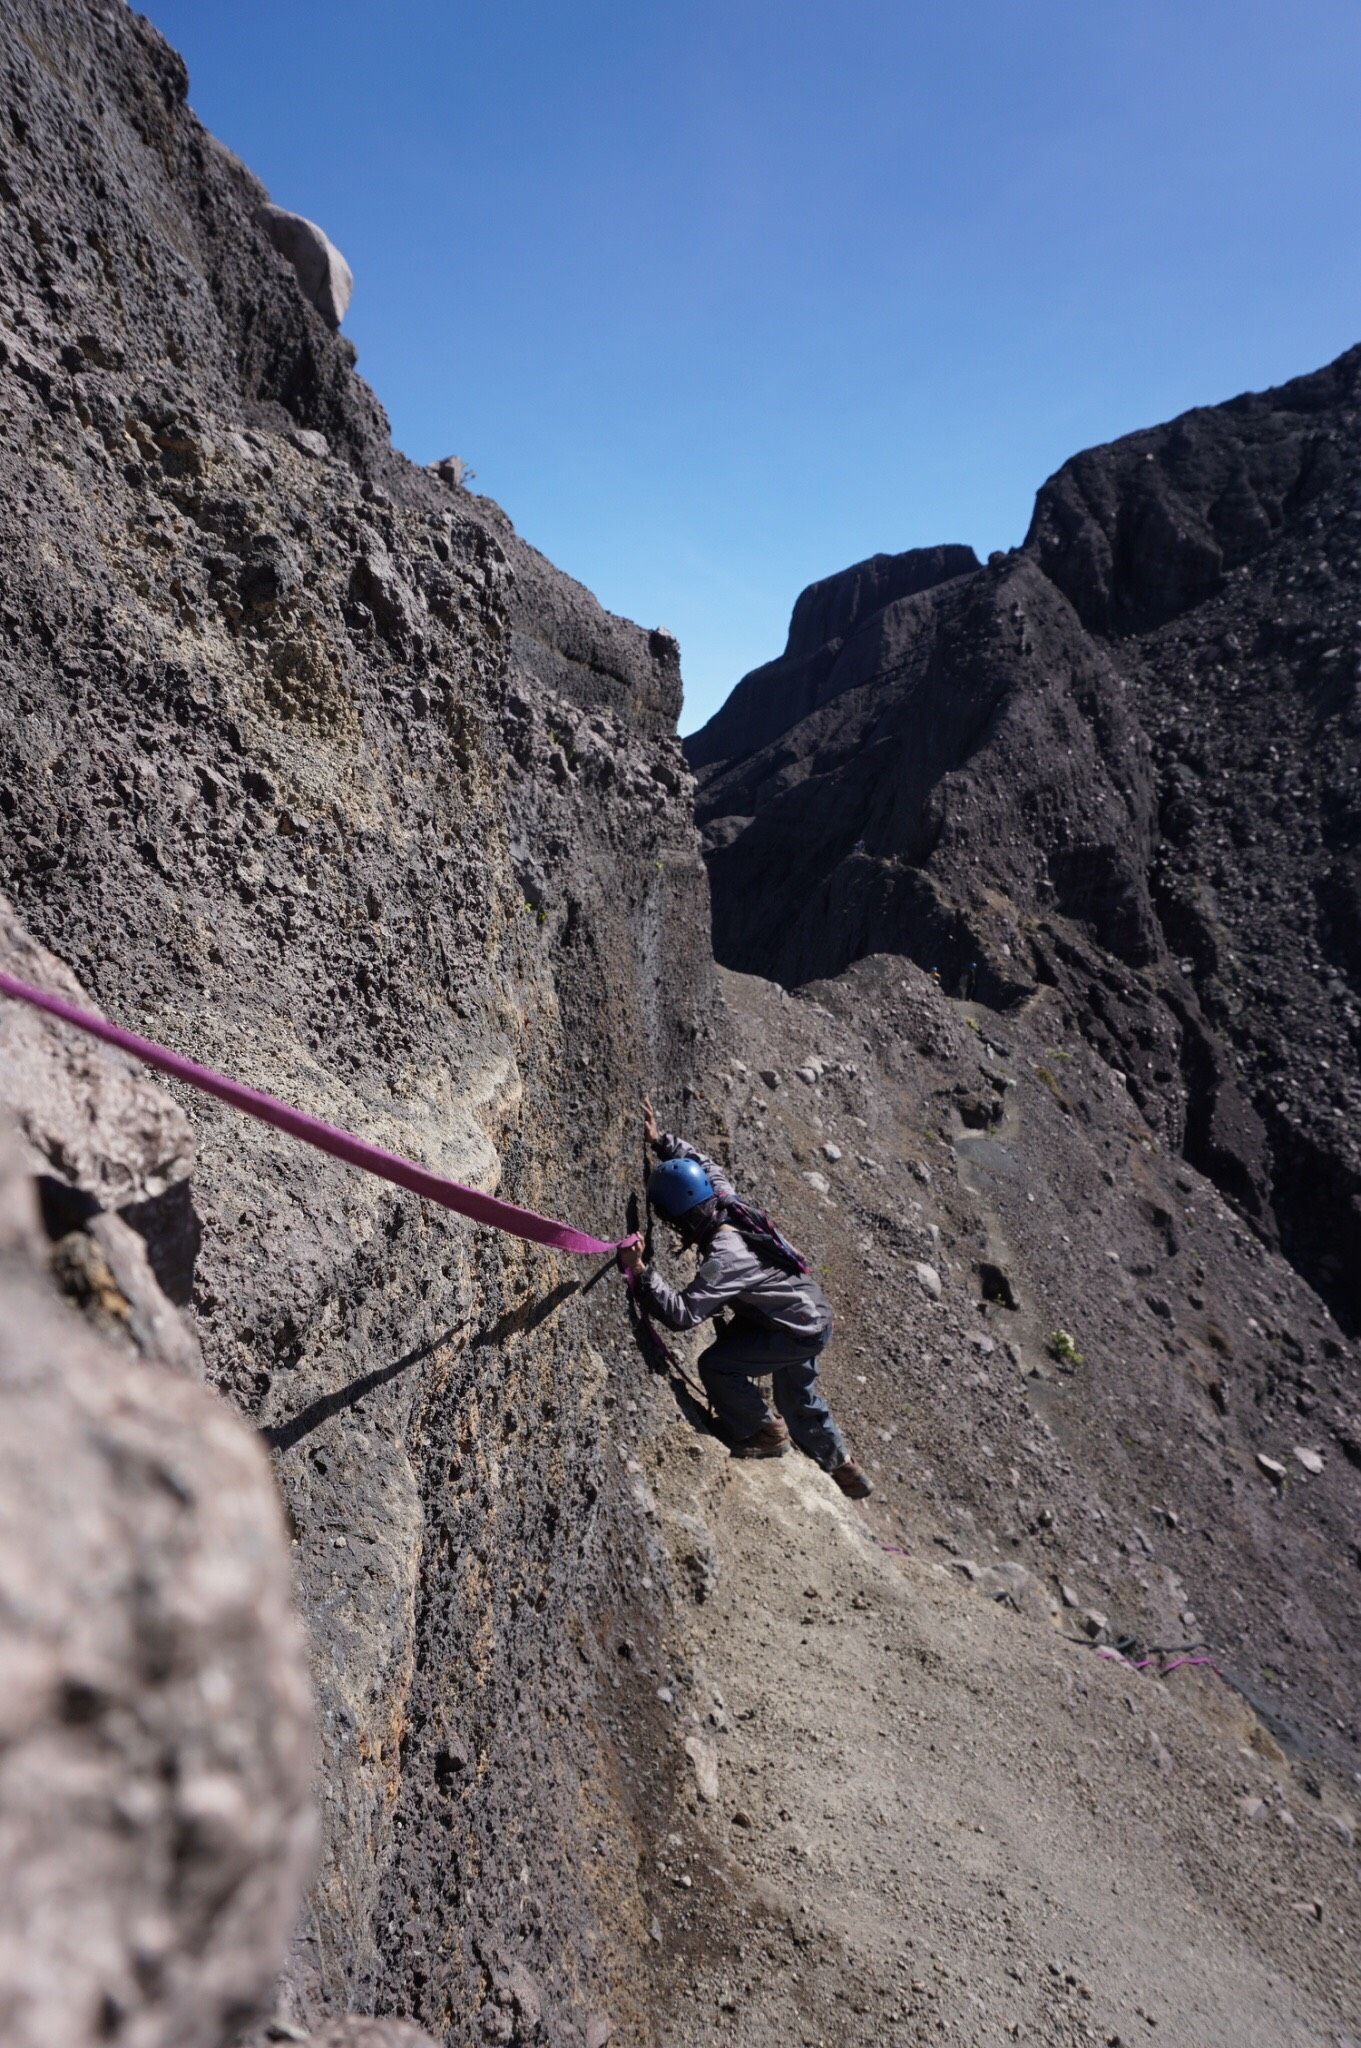 File Jalur Pendakian Gunung Raung 7 Jpg Wikimedia Commons